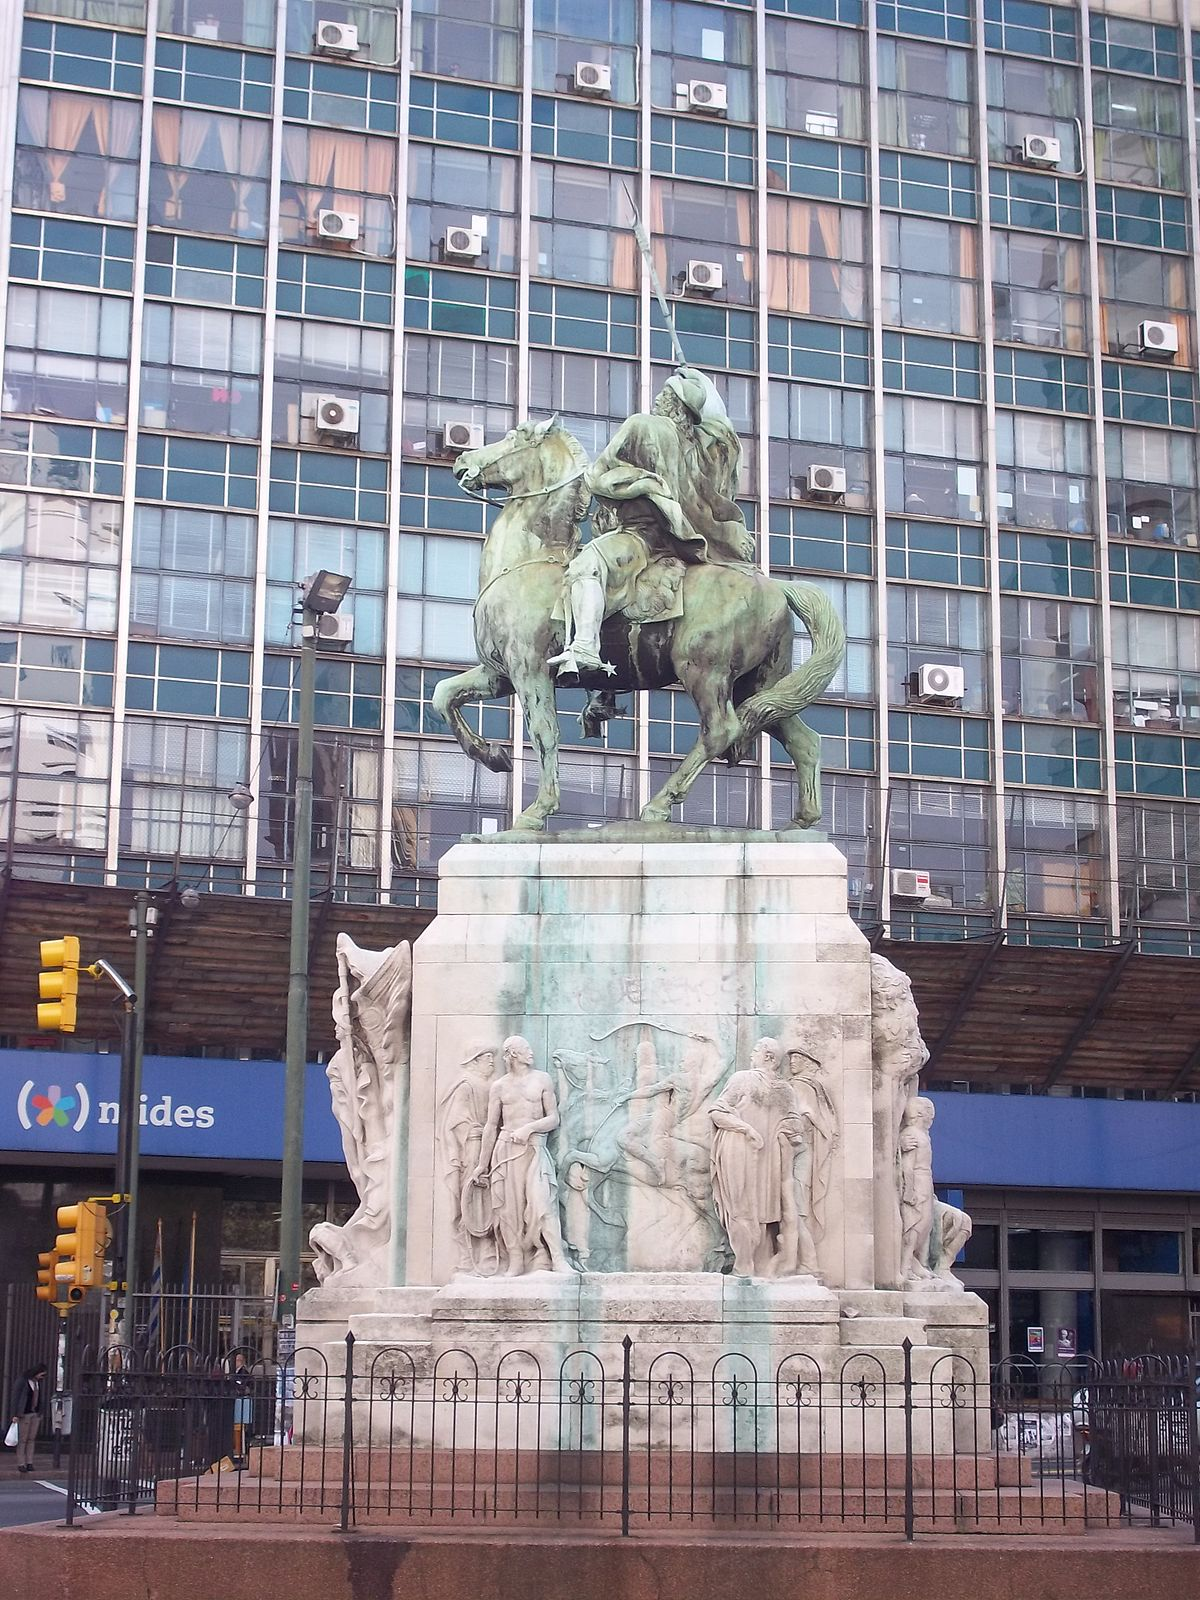 Monumento al Gaucho - Wikipedia, la enciclopedia libre